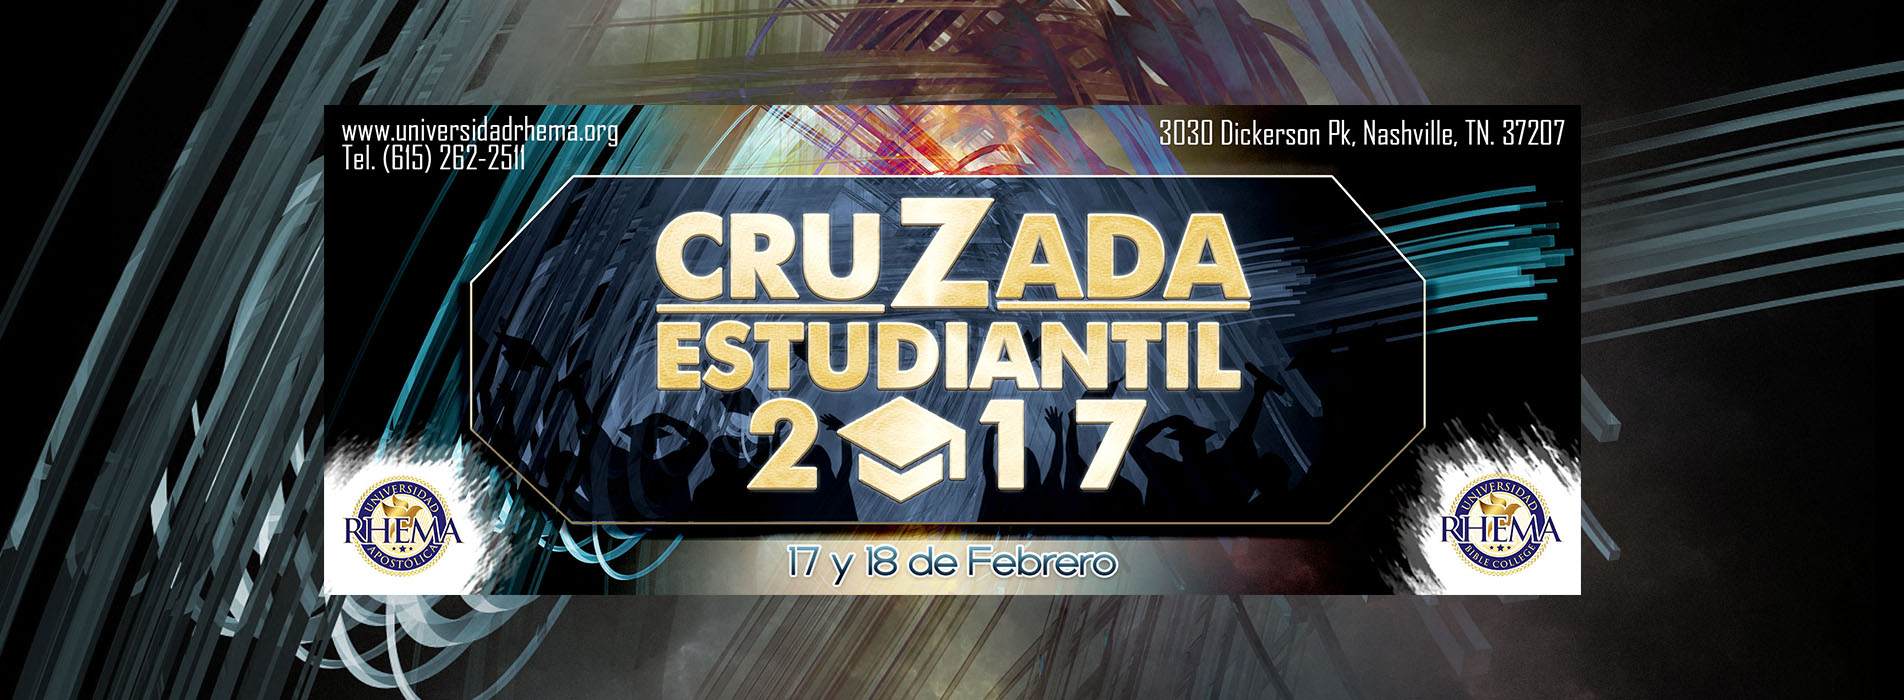 Slider-Cruzada-Estudiantil-2017